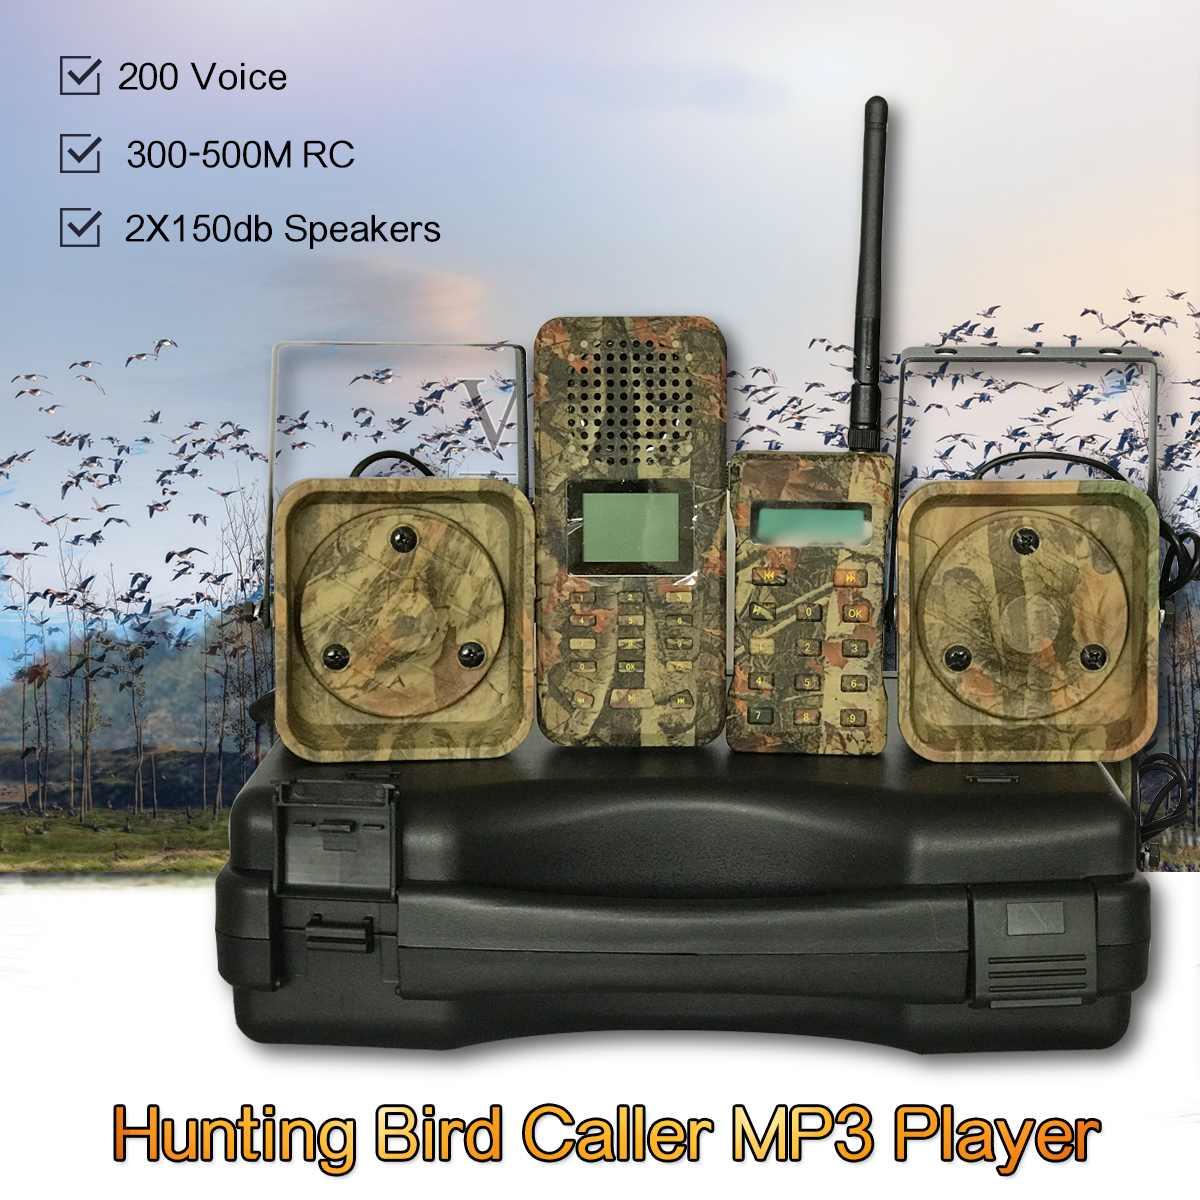 2 * 50w 150dB  Loud Speakers 300m-500m Remote Hunting Bird Caller Duck Goose Firrie Sounds Decoy2 * 50w 150dB  Loud Speakers 300m-500m Remote Hunting Bird Caller Duck Goose Firrie Sounds Decoy